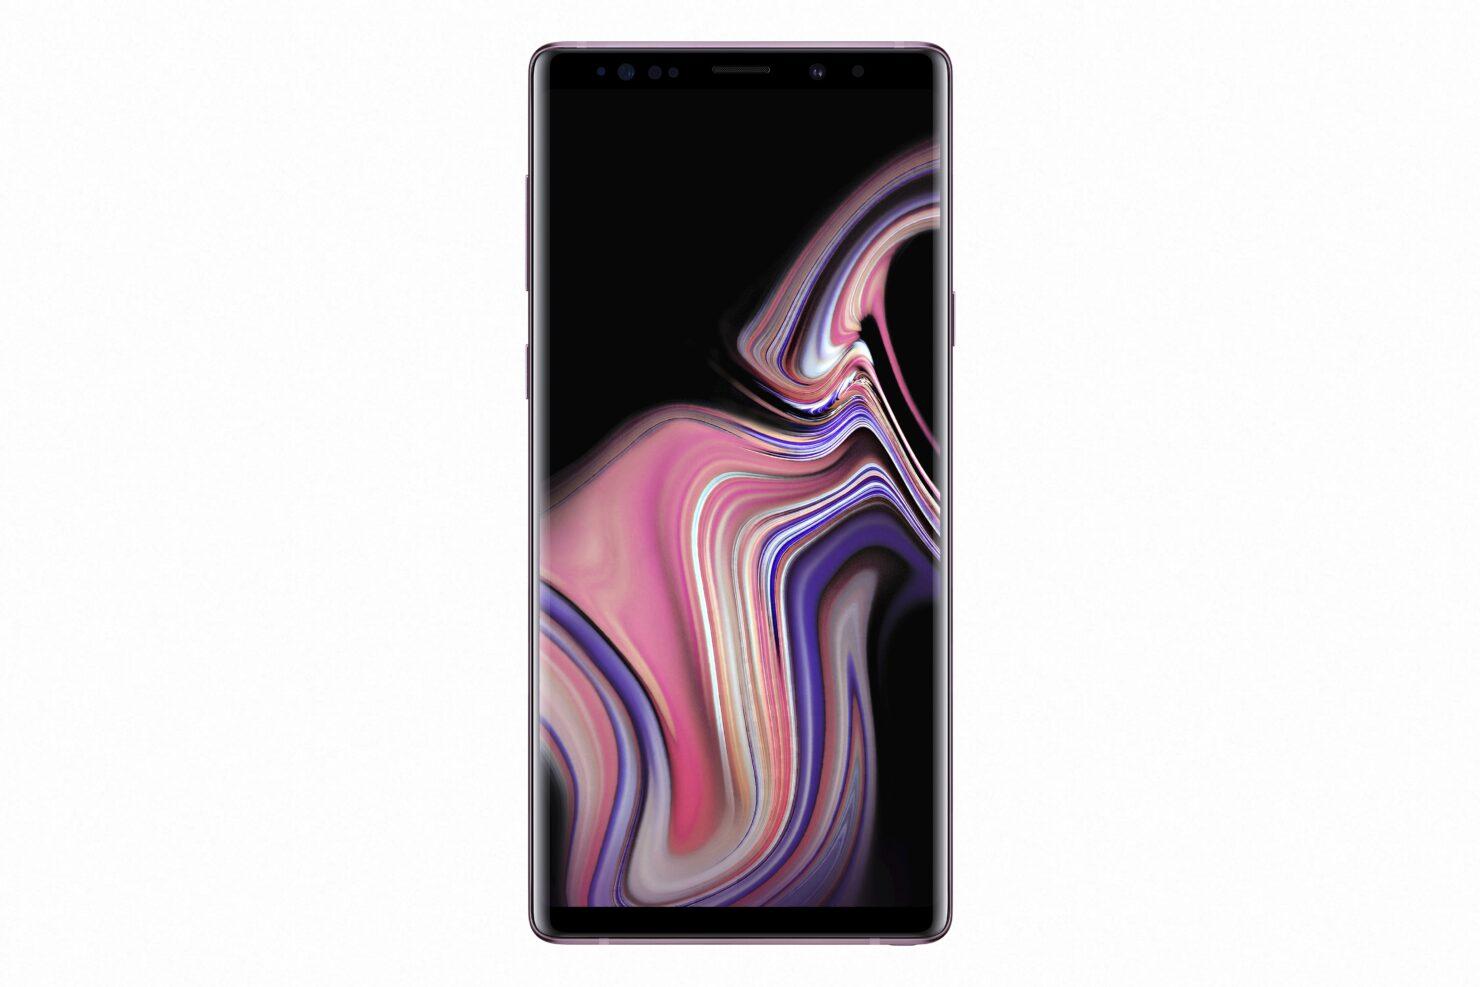 img_lavender-purple_180529_sm_n960f_galaxynote9_front_purple_